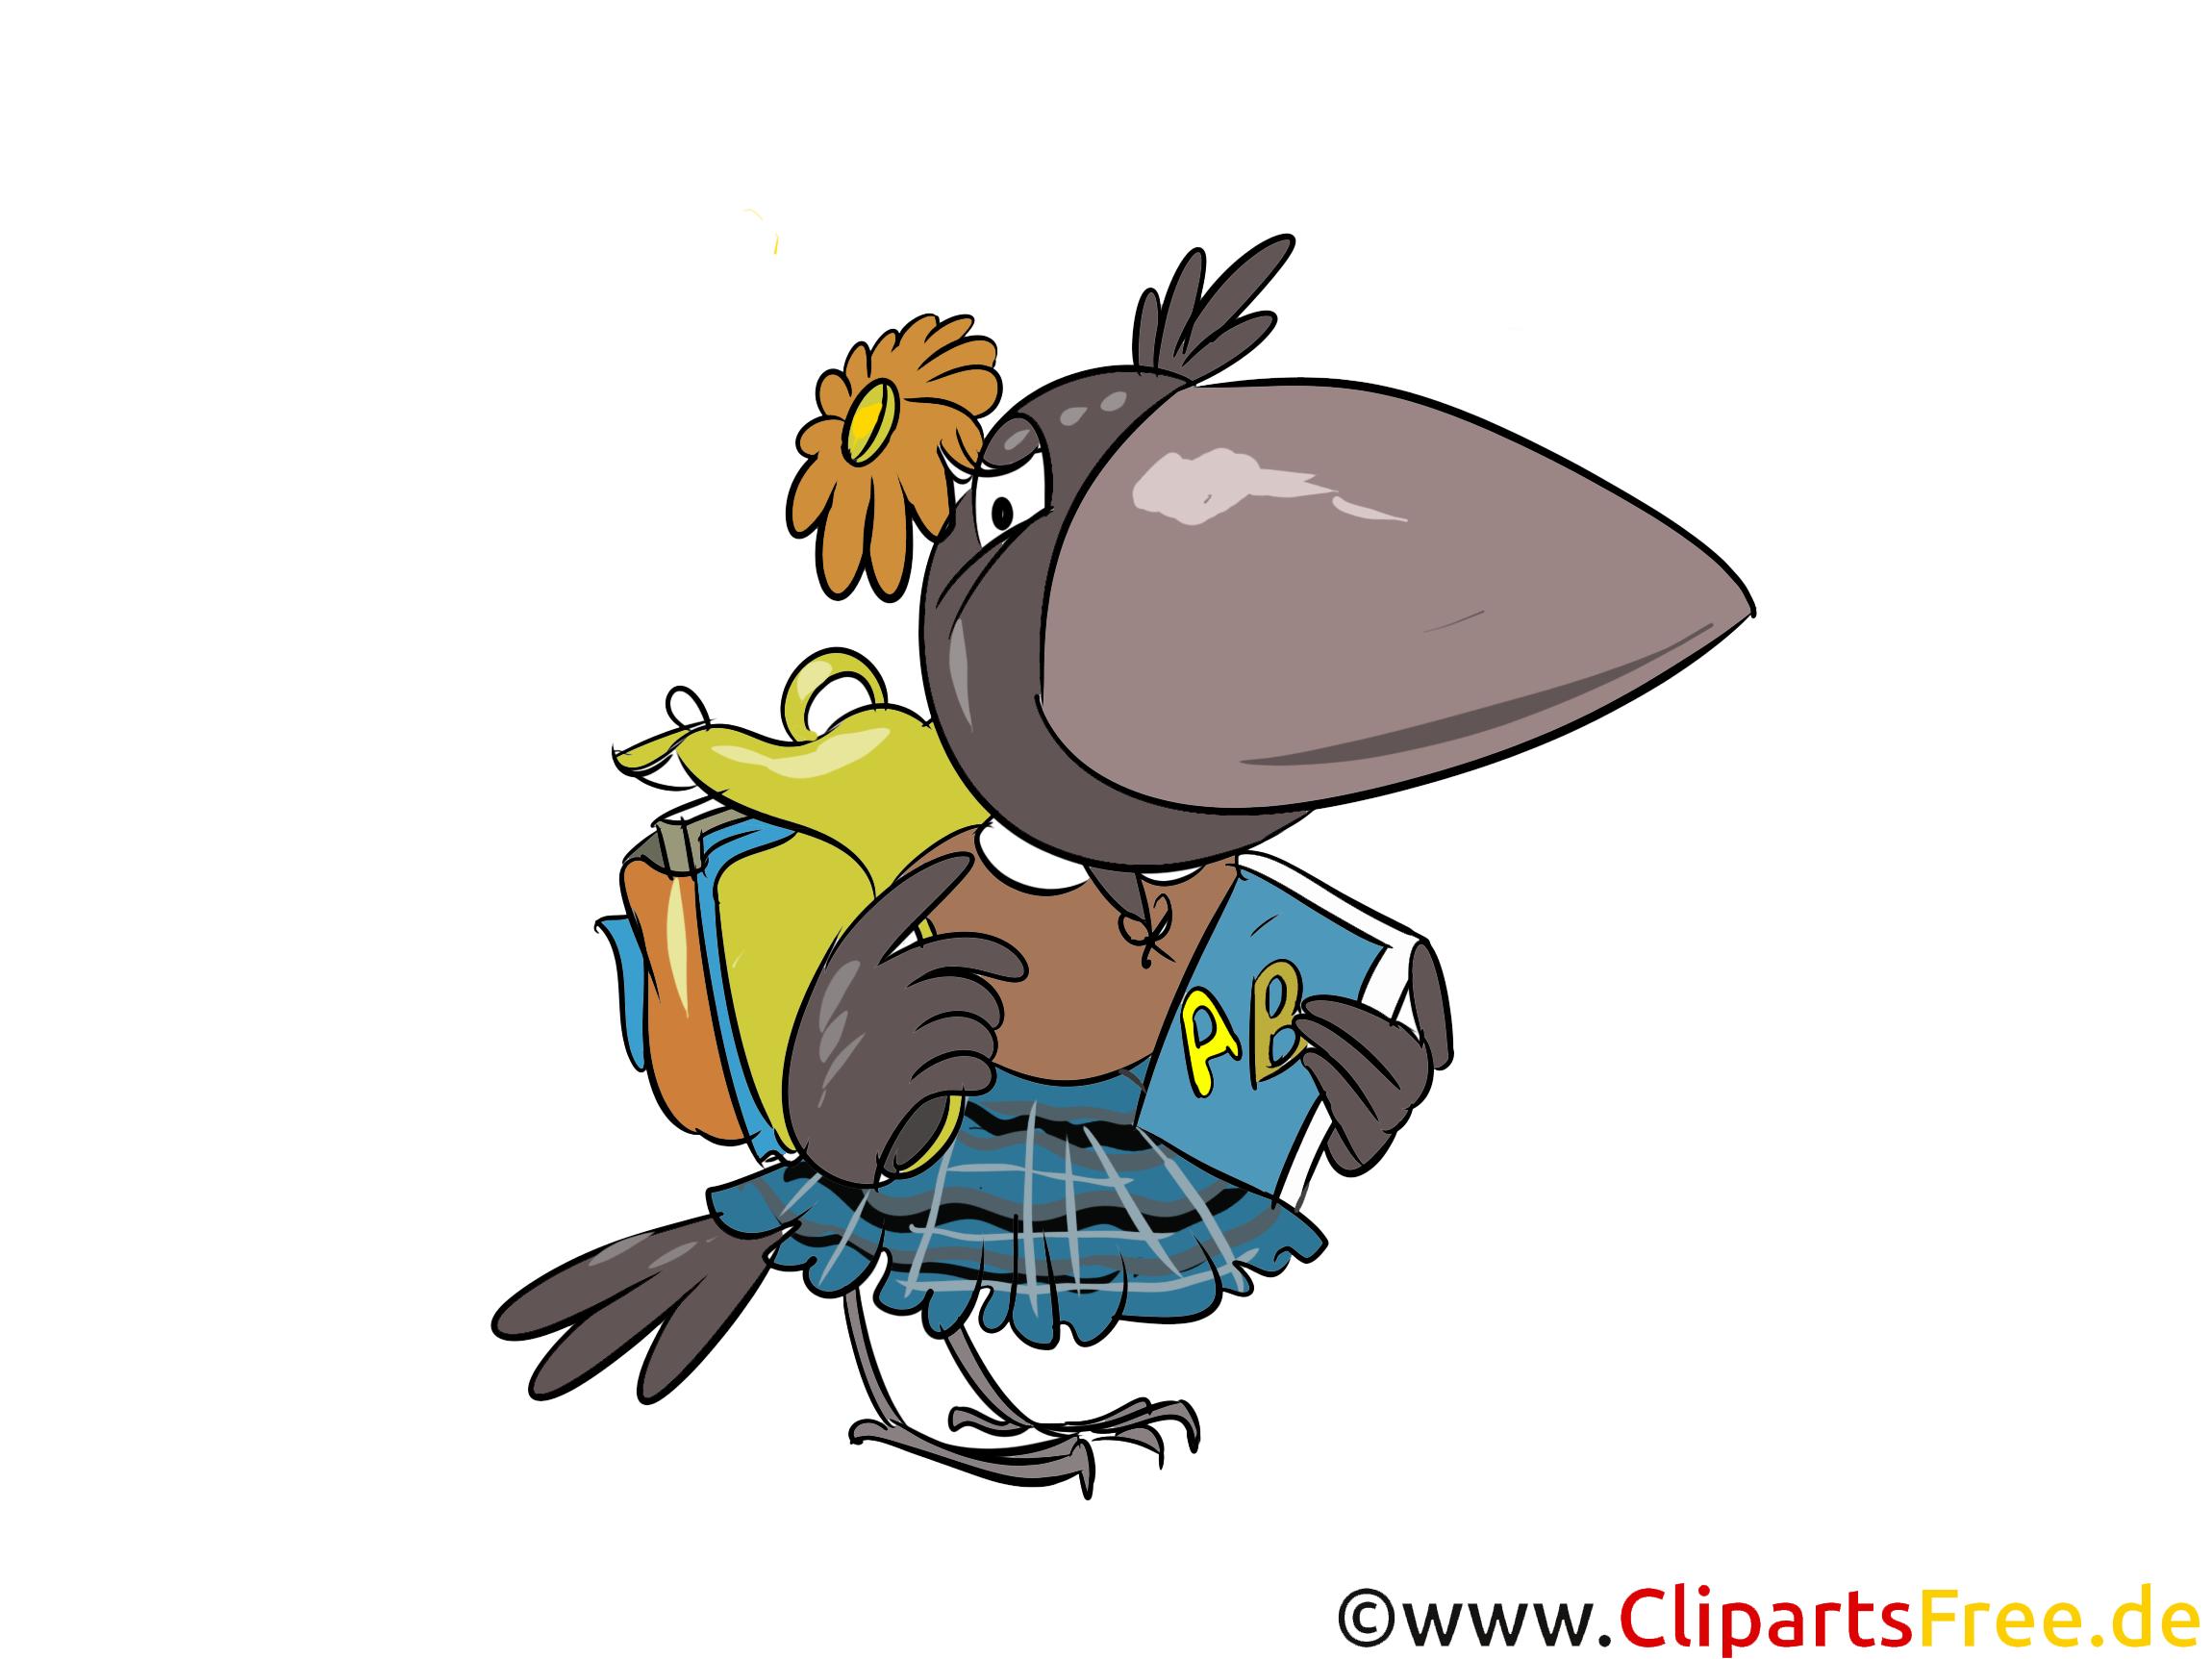 Krähe, Schülerin, Schulranzen, Schule Clipart-Bild